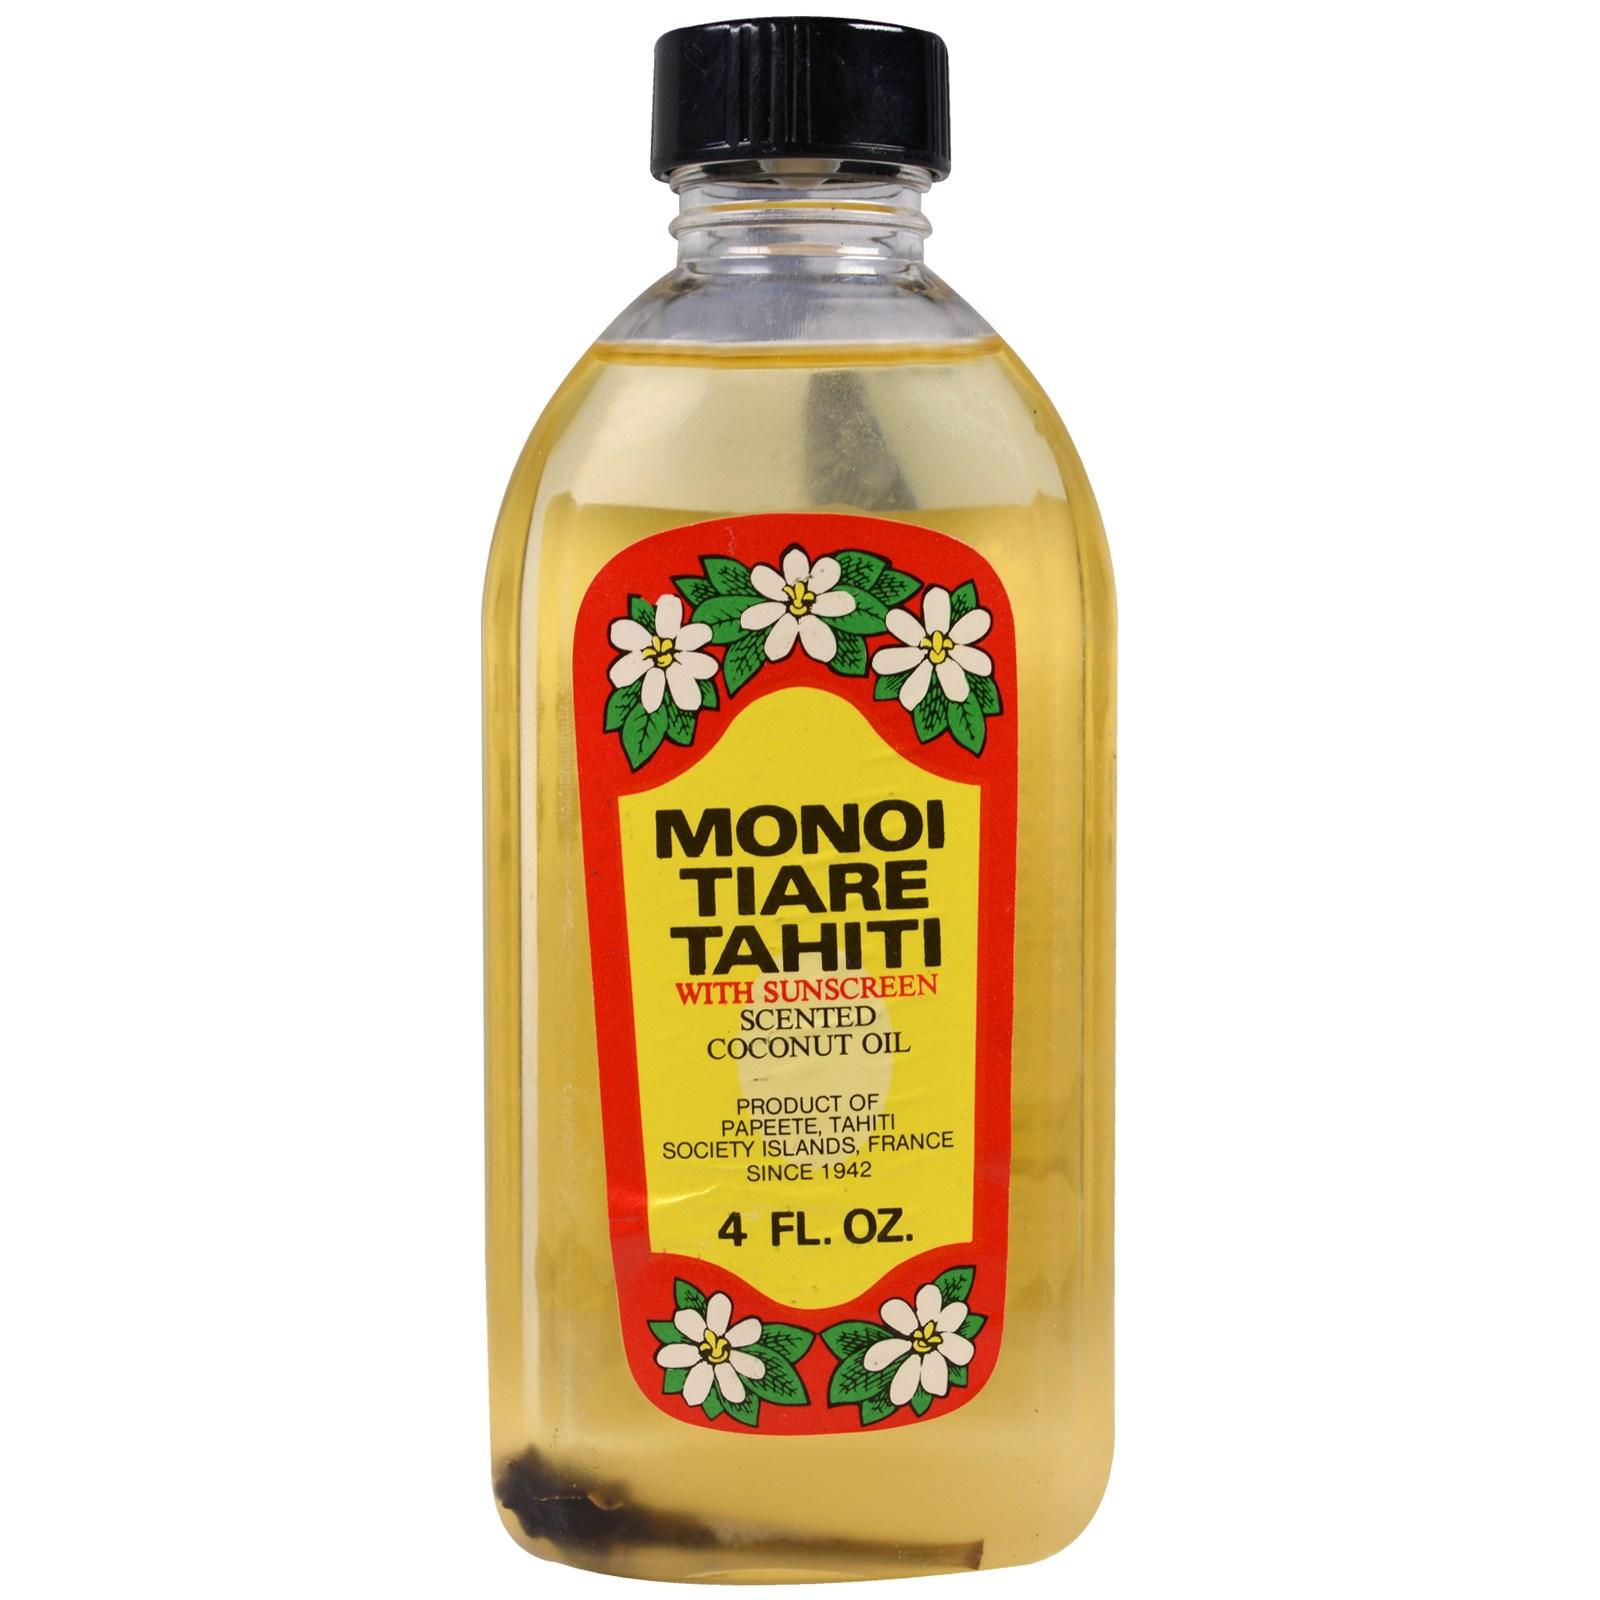 Monoi Tiare Tahiti, Масло для загара с солнцезащитным экраном, 120 мл (4 унции)